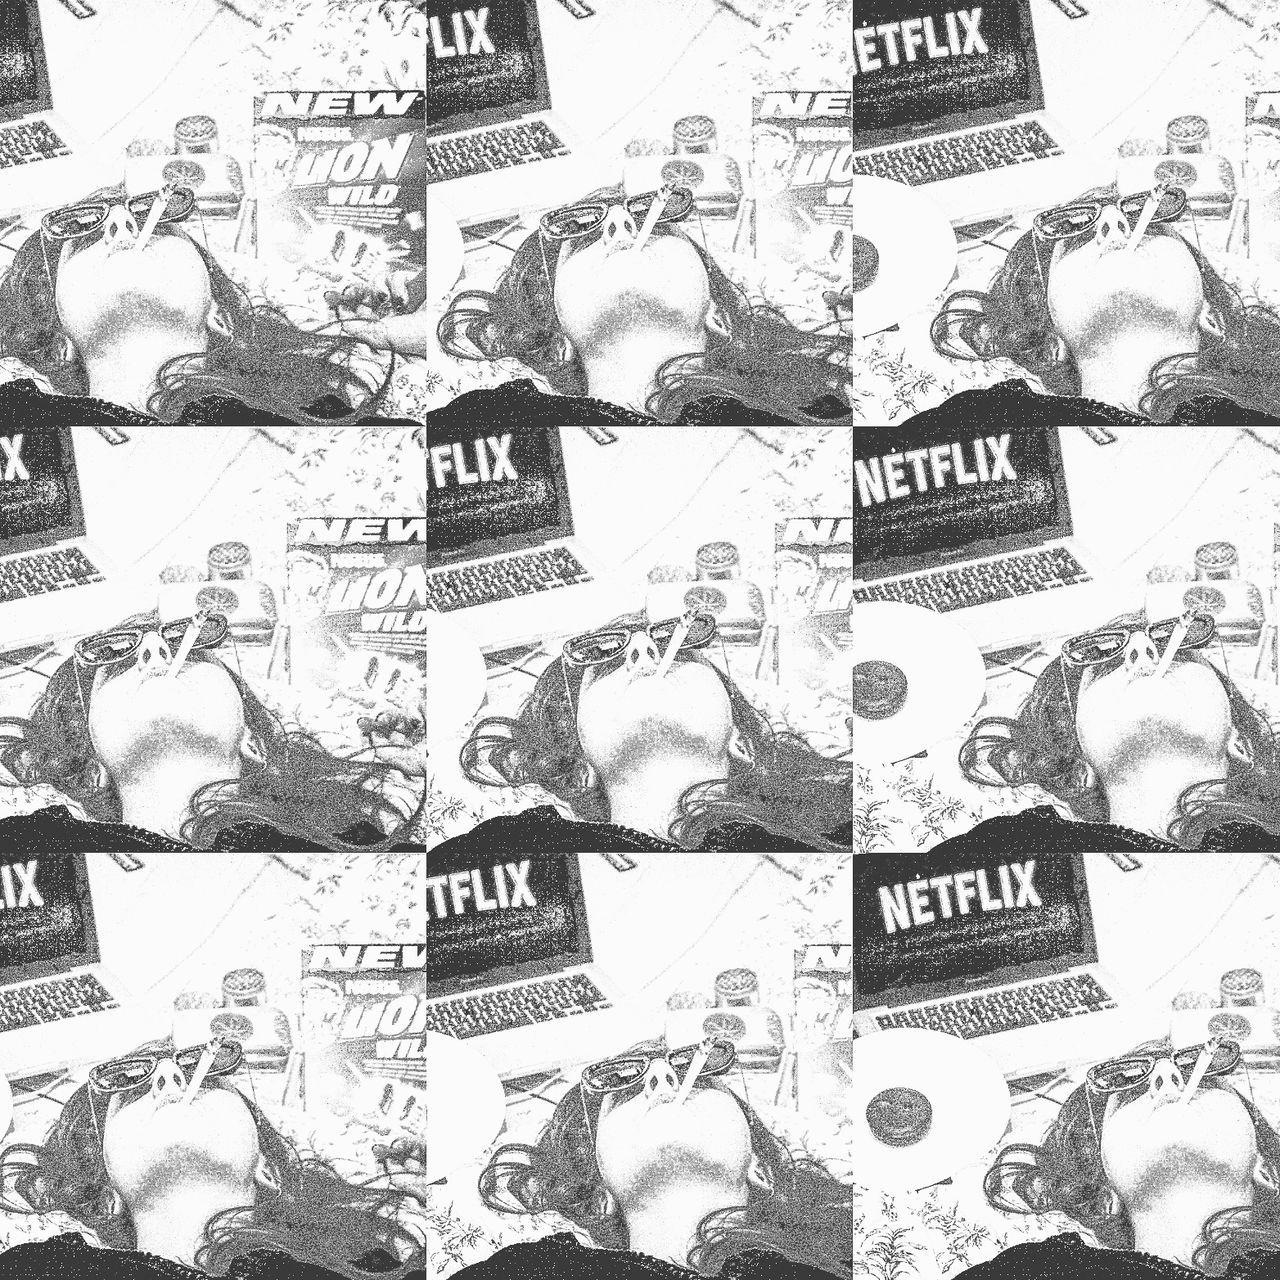 Pattern Abstract Backgrounds Pencil Drawing People Tree Long Hair Headshot Sunlight Flower Real People Eat Netflixandchill Sky Halloweed Myhalloween Halloween Autoportrait Close-up Day Multi-layered Effect Women Netflix MOVIE Paris